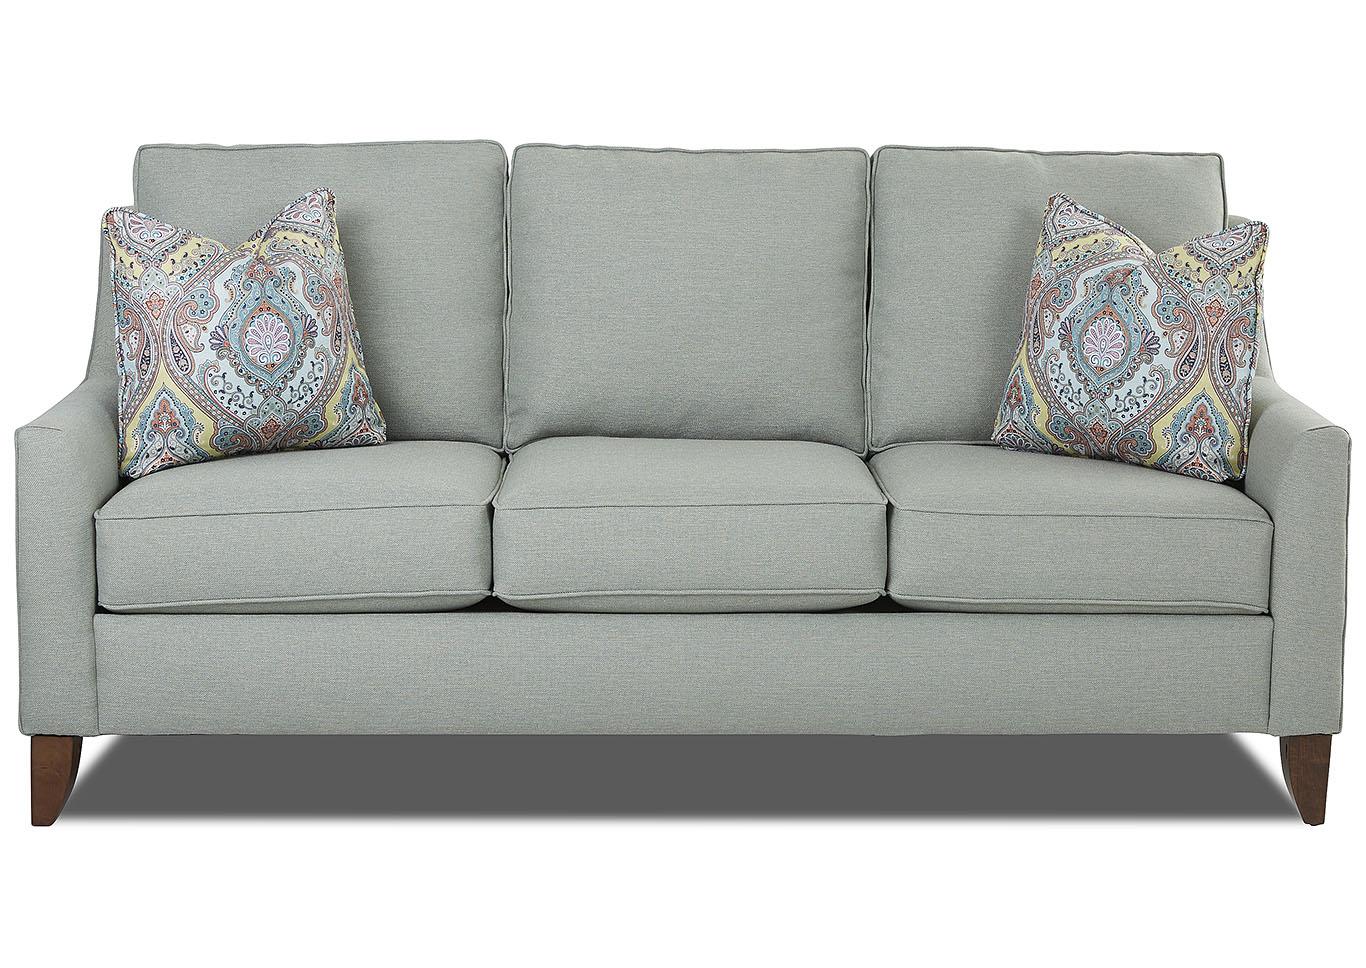 Amite City Furniture - Amite, LA Belton Green Stationary ...